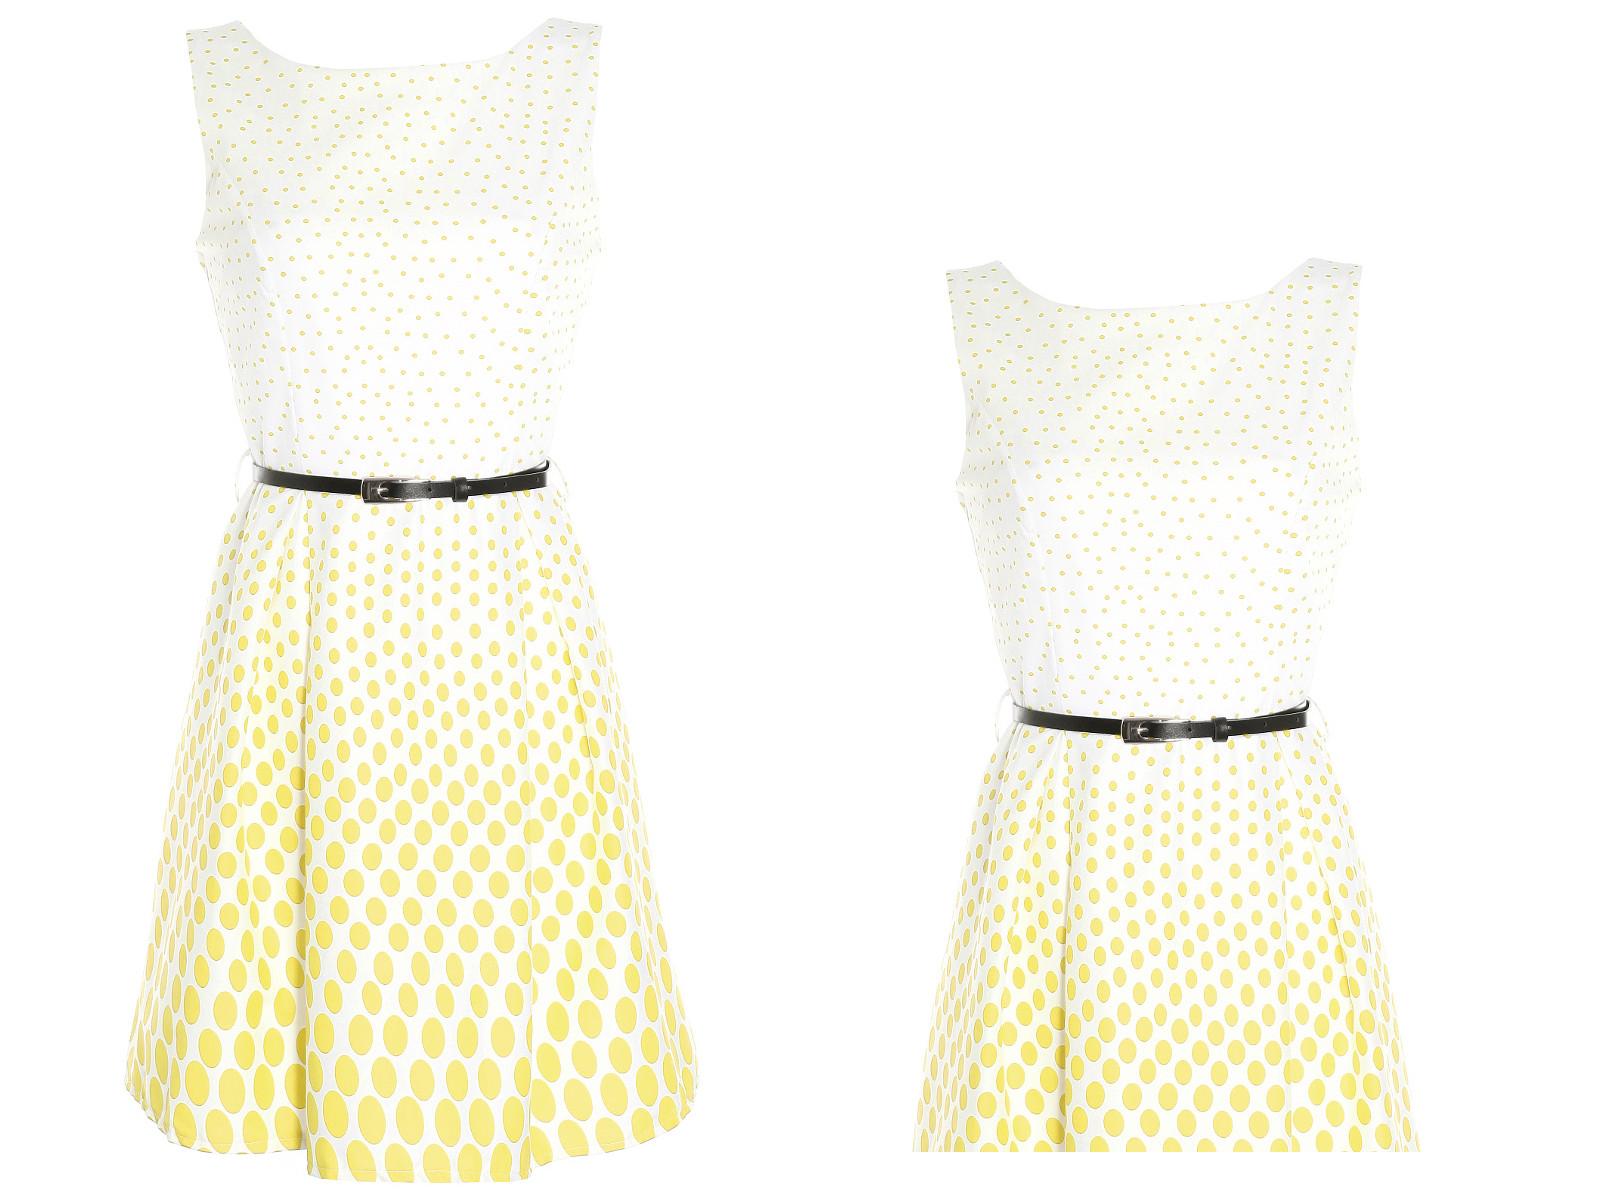 89c178caee OUTLET Sukienka letnia rozkloszowana lato A169 36 - 6833222166 ...